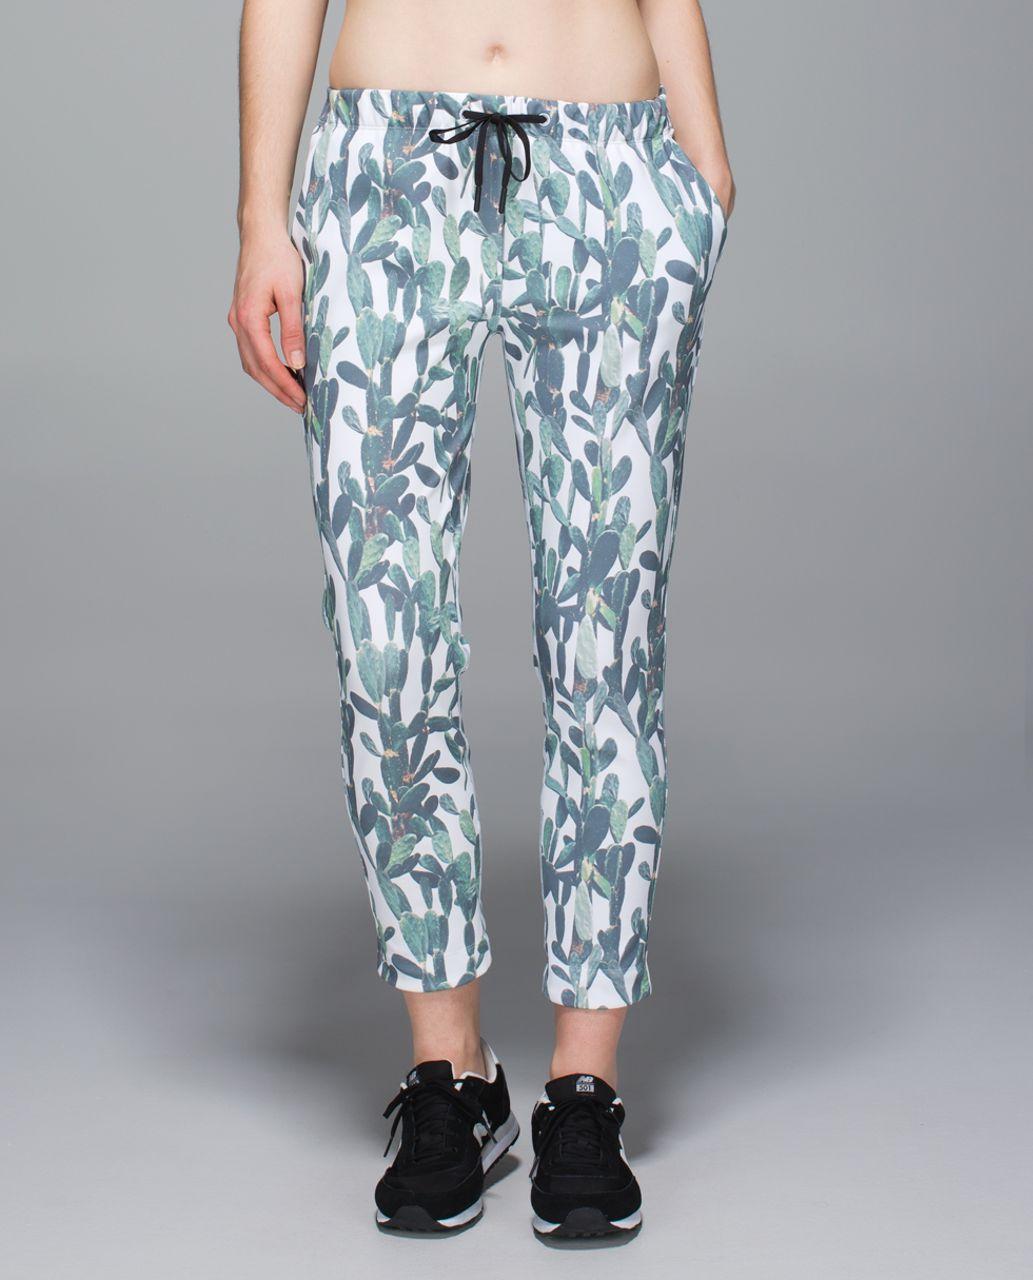 Lululemon Jet Crop *Slim Trouser - Mini Prickly Pear White Multi / White